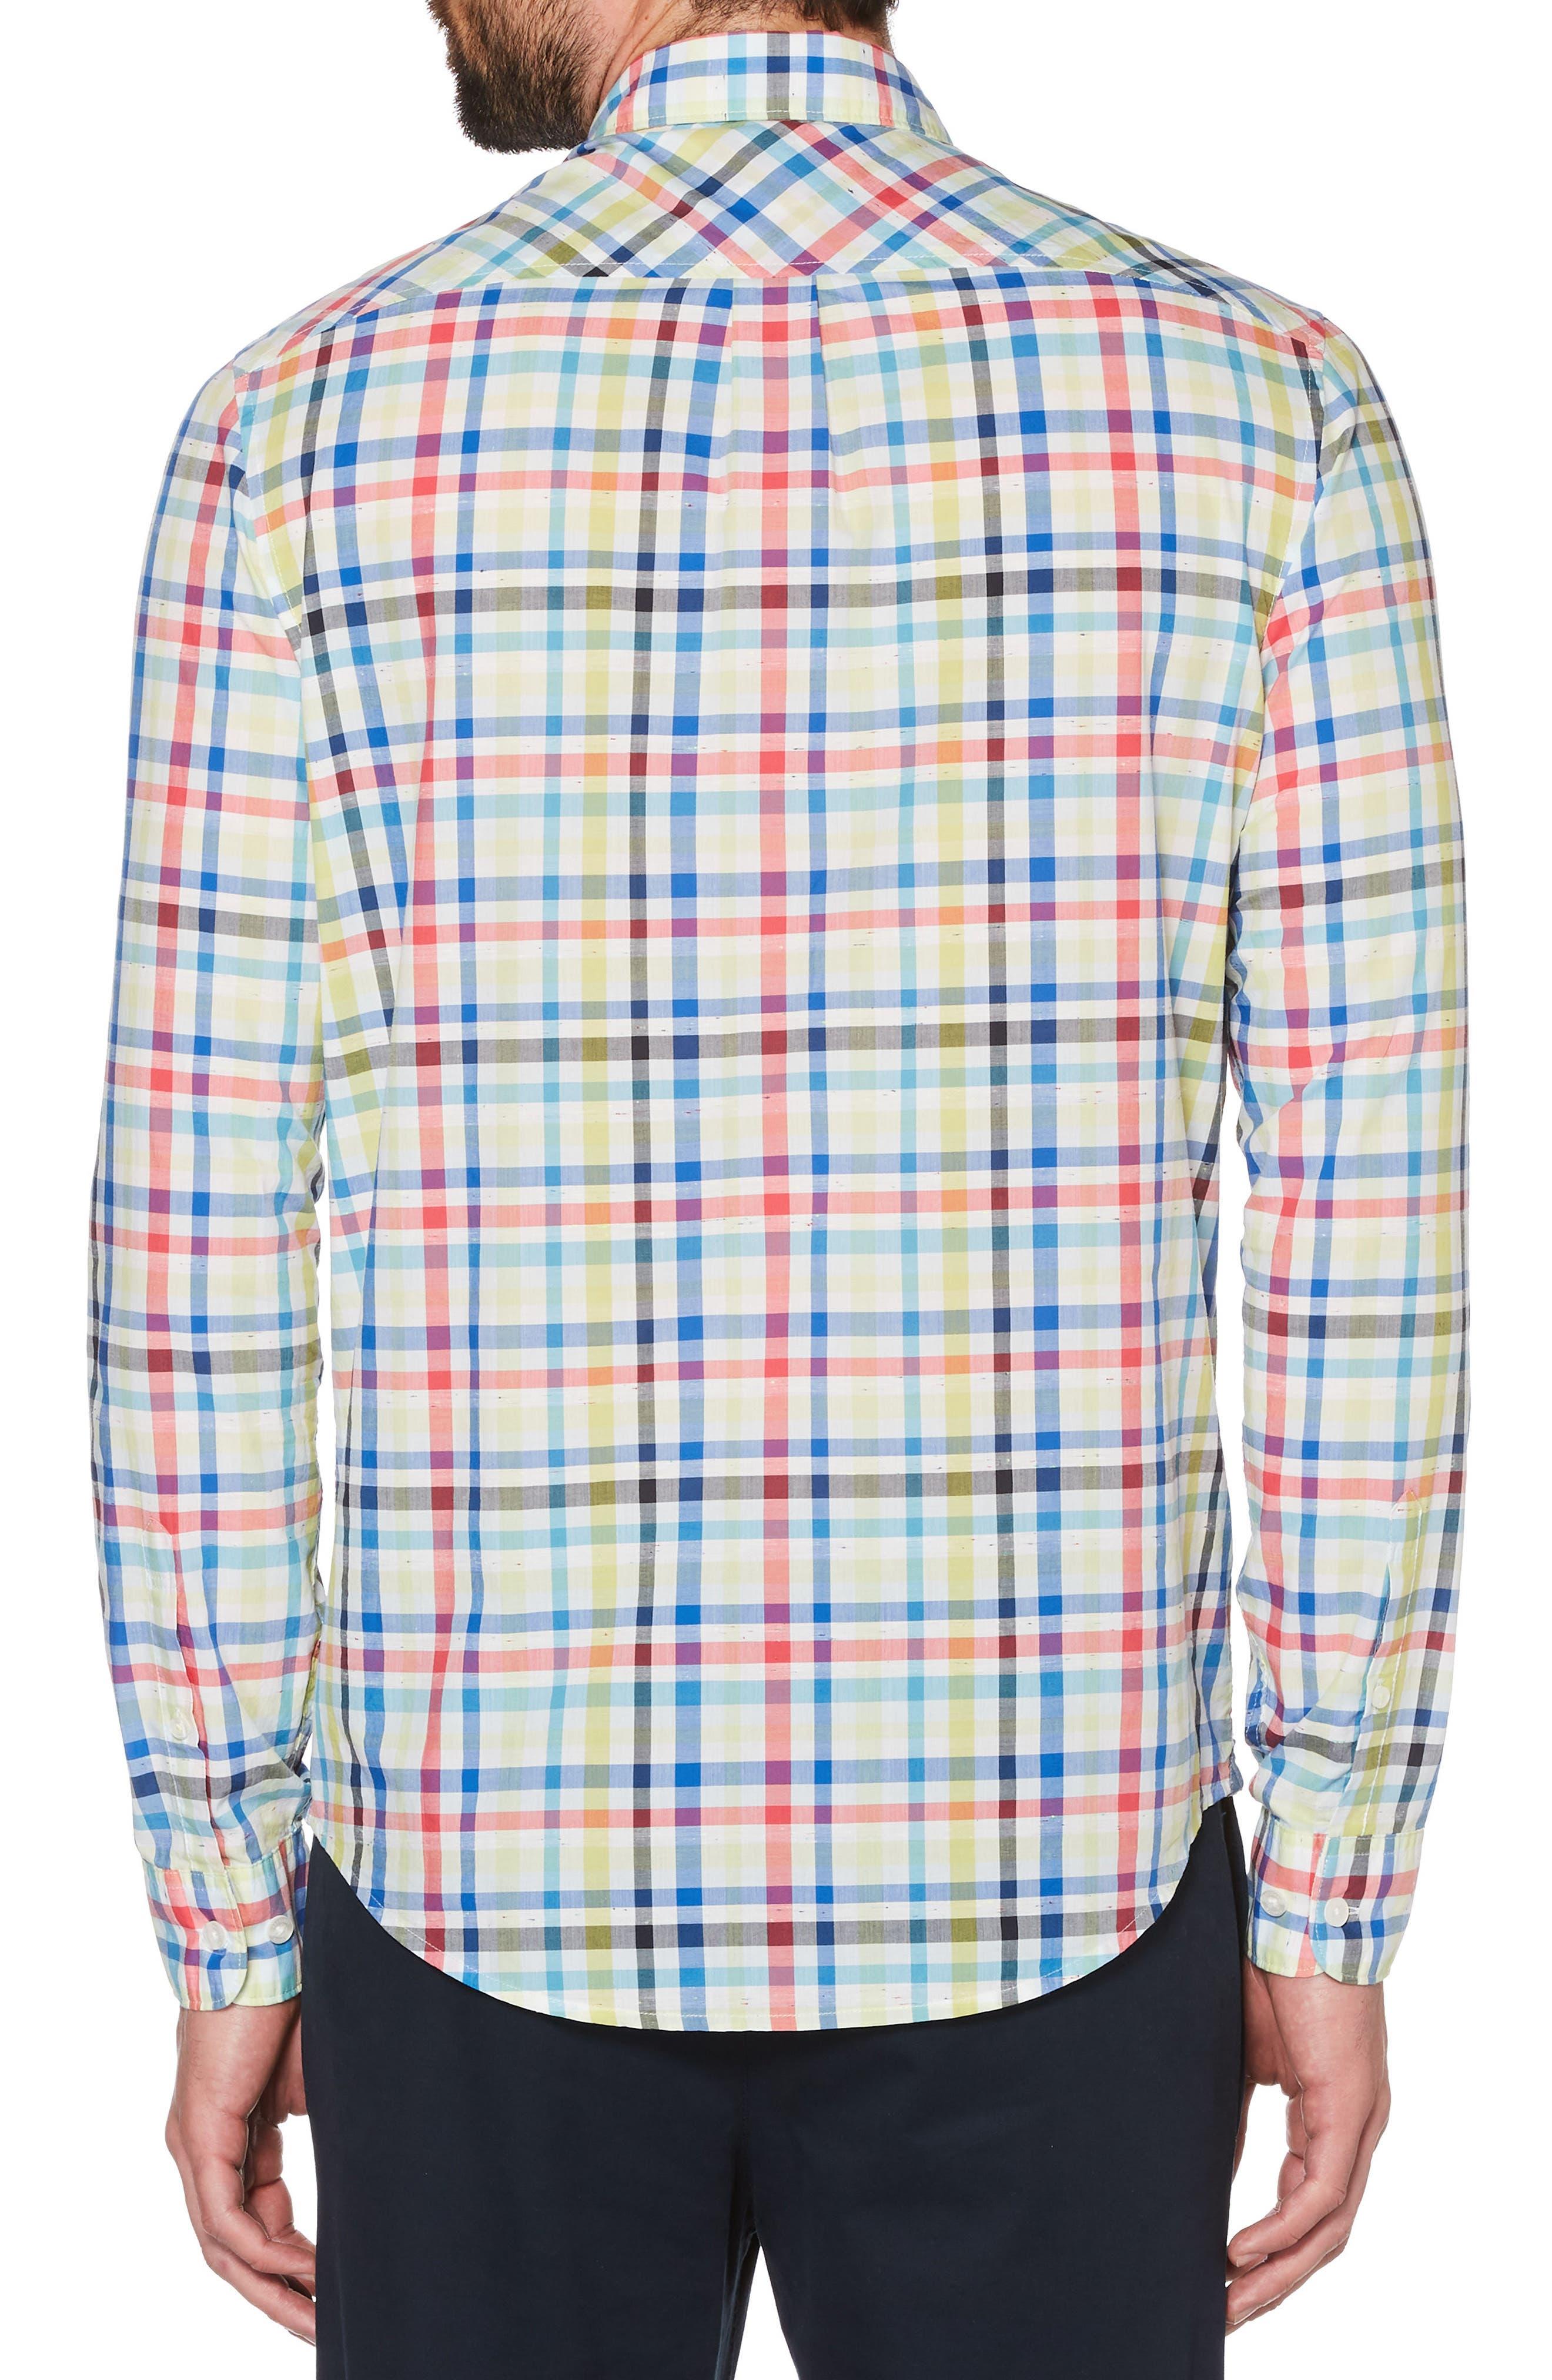 P55 Plaid Woven Shirt,                             Alternate thumbnail 2, color,                             462